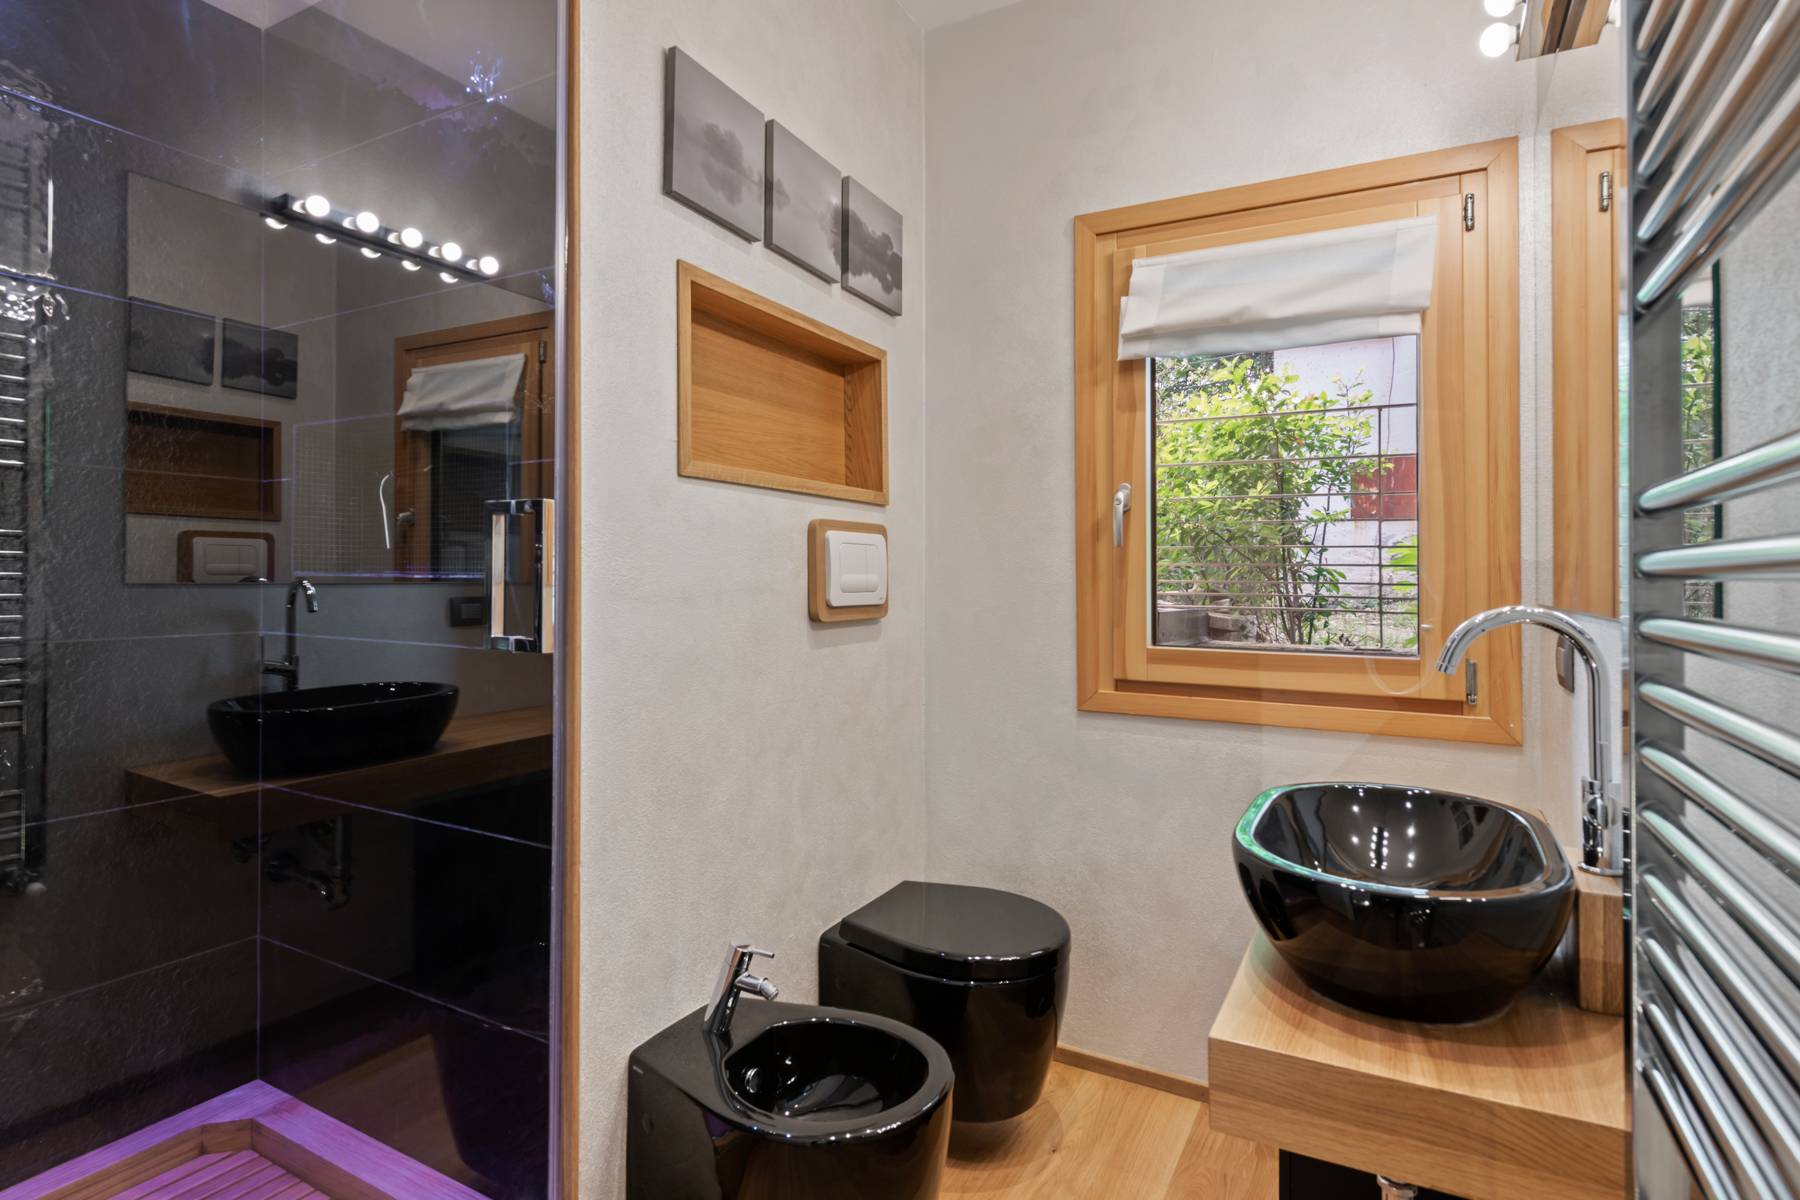 Appartamento in Vendita a Pontassieve: 5 locali, 300 mq - Foto 14